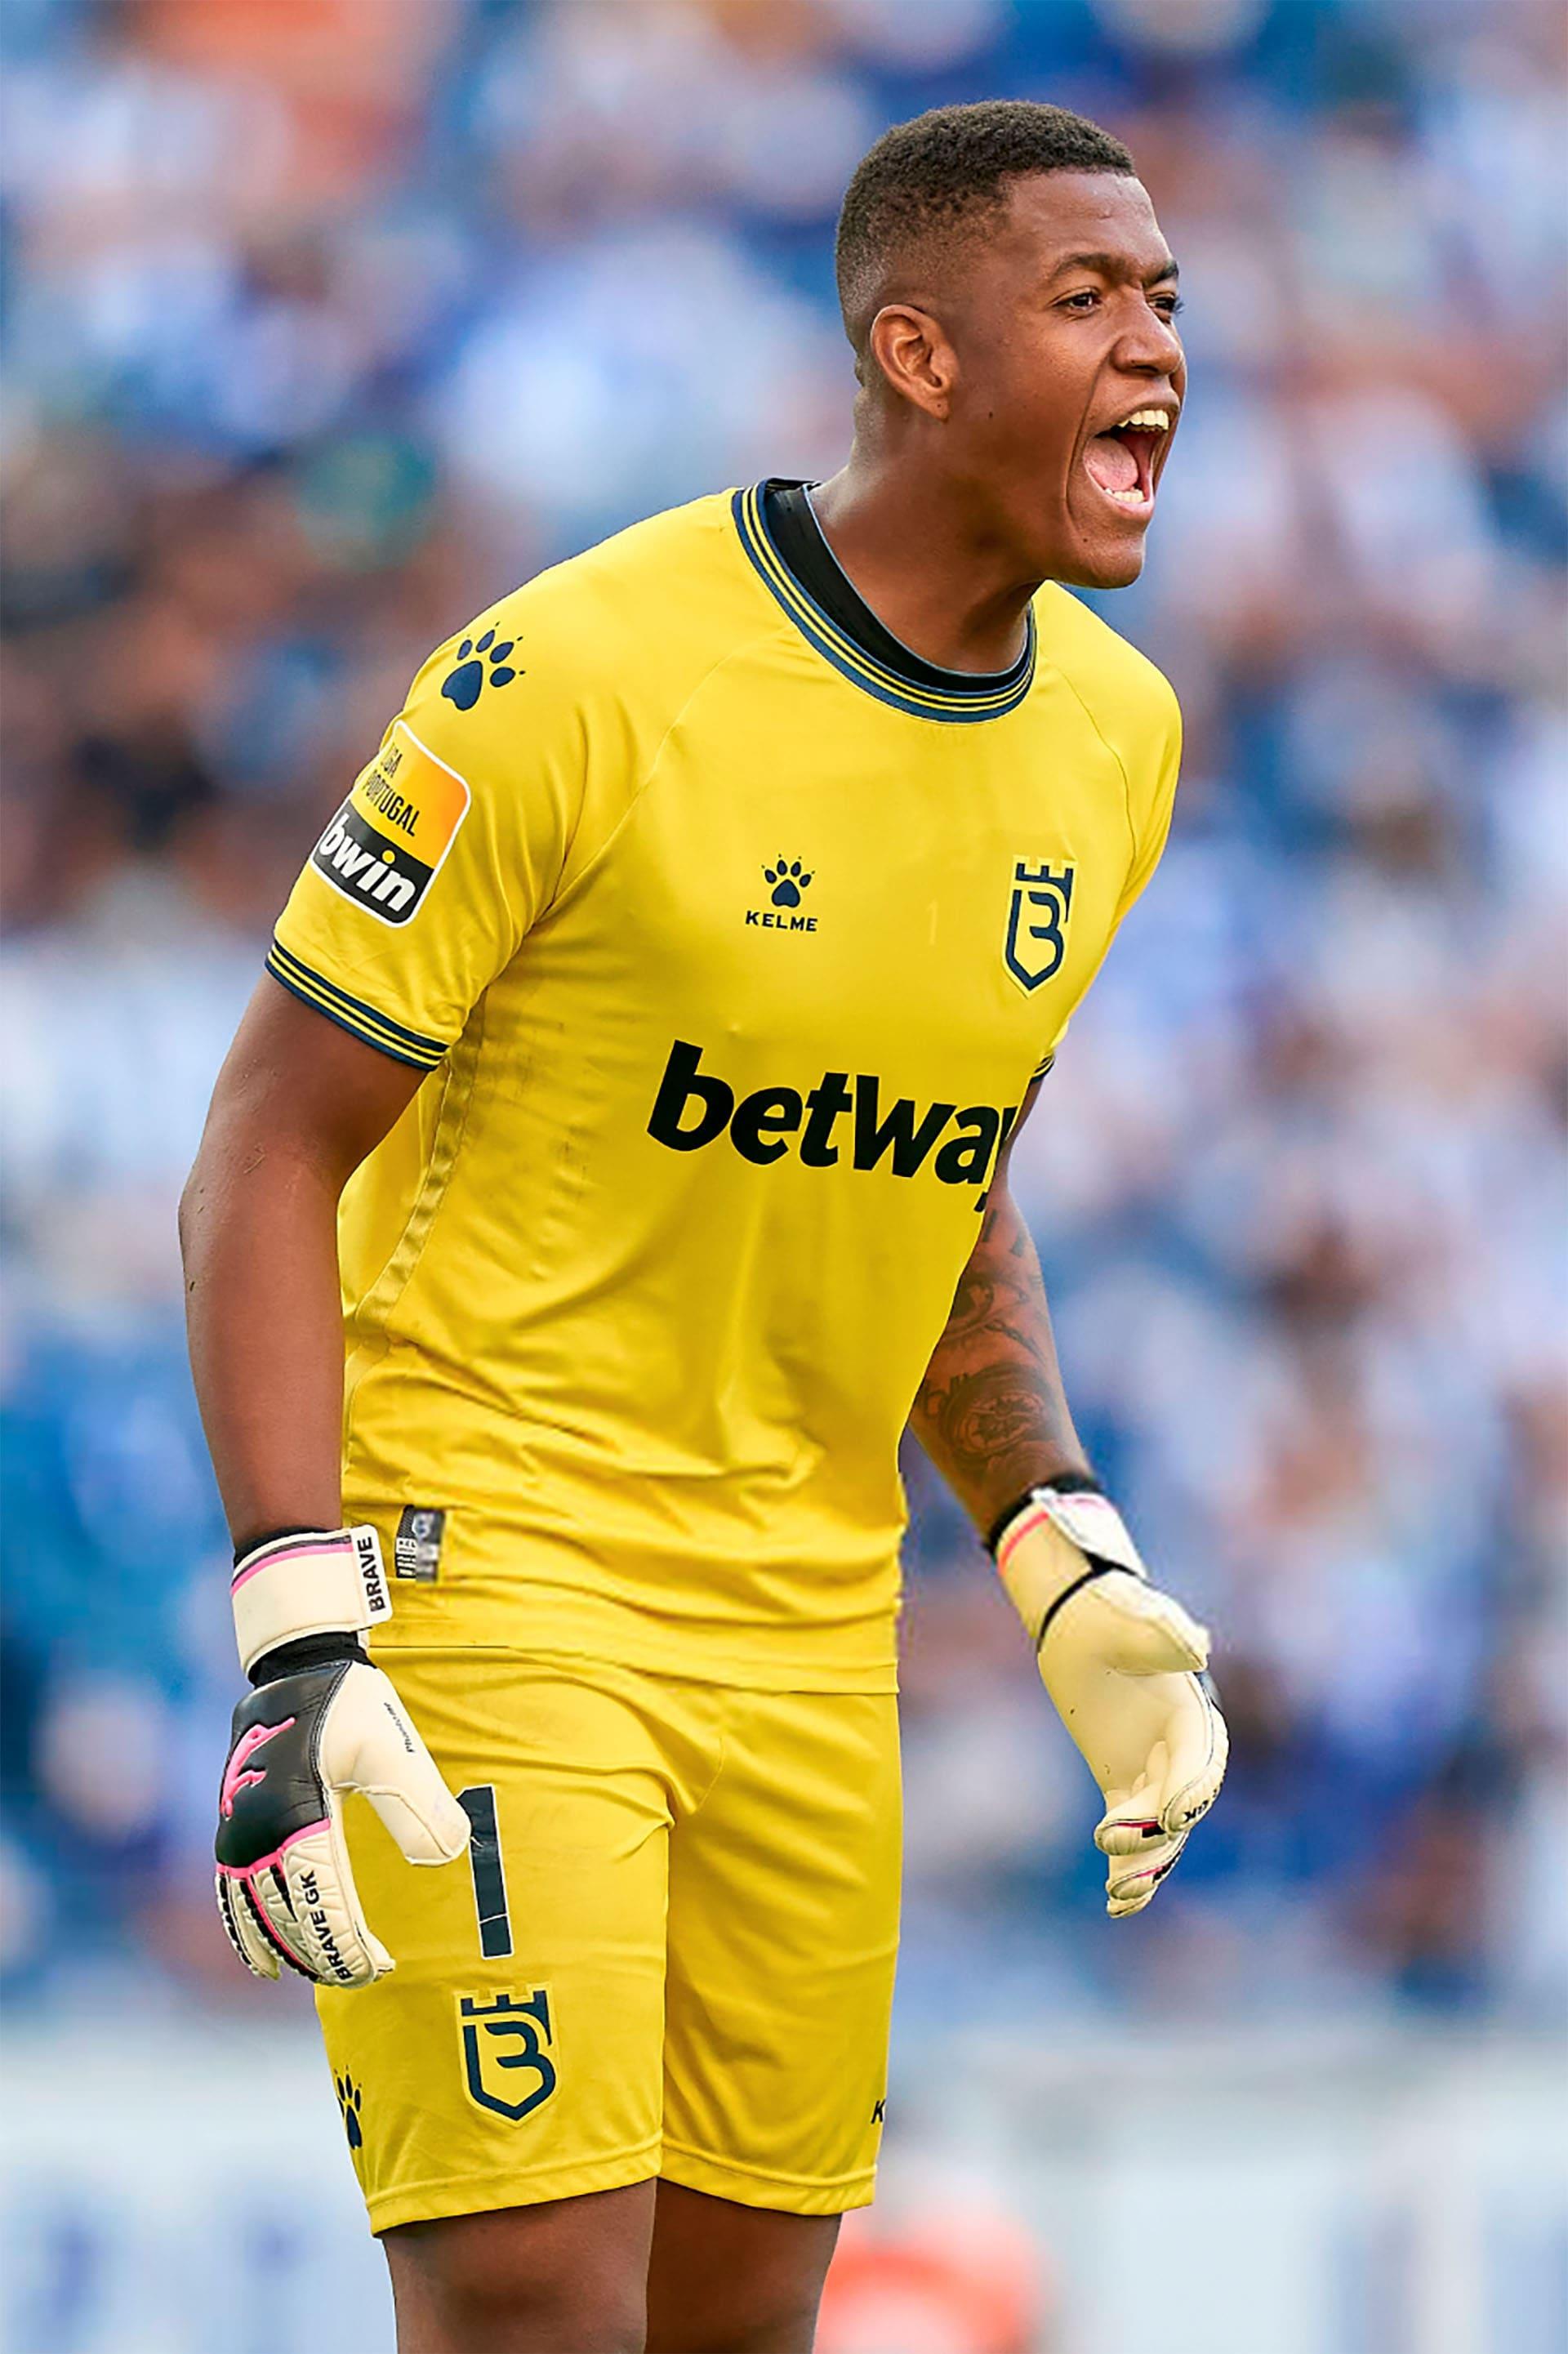 in 2021, Luis Filipe became a player of the Lisbon team Belenenses - shop Brave GK